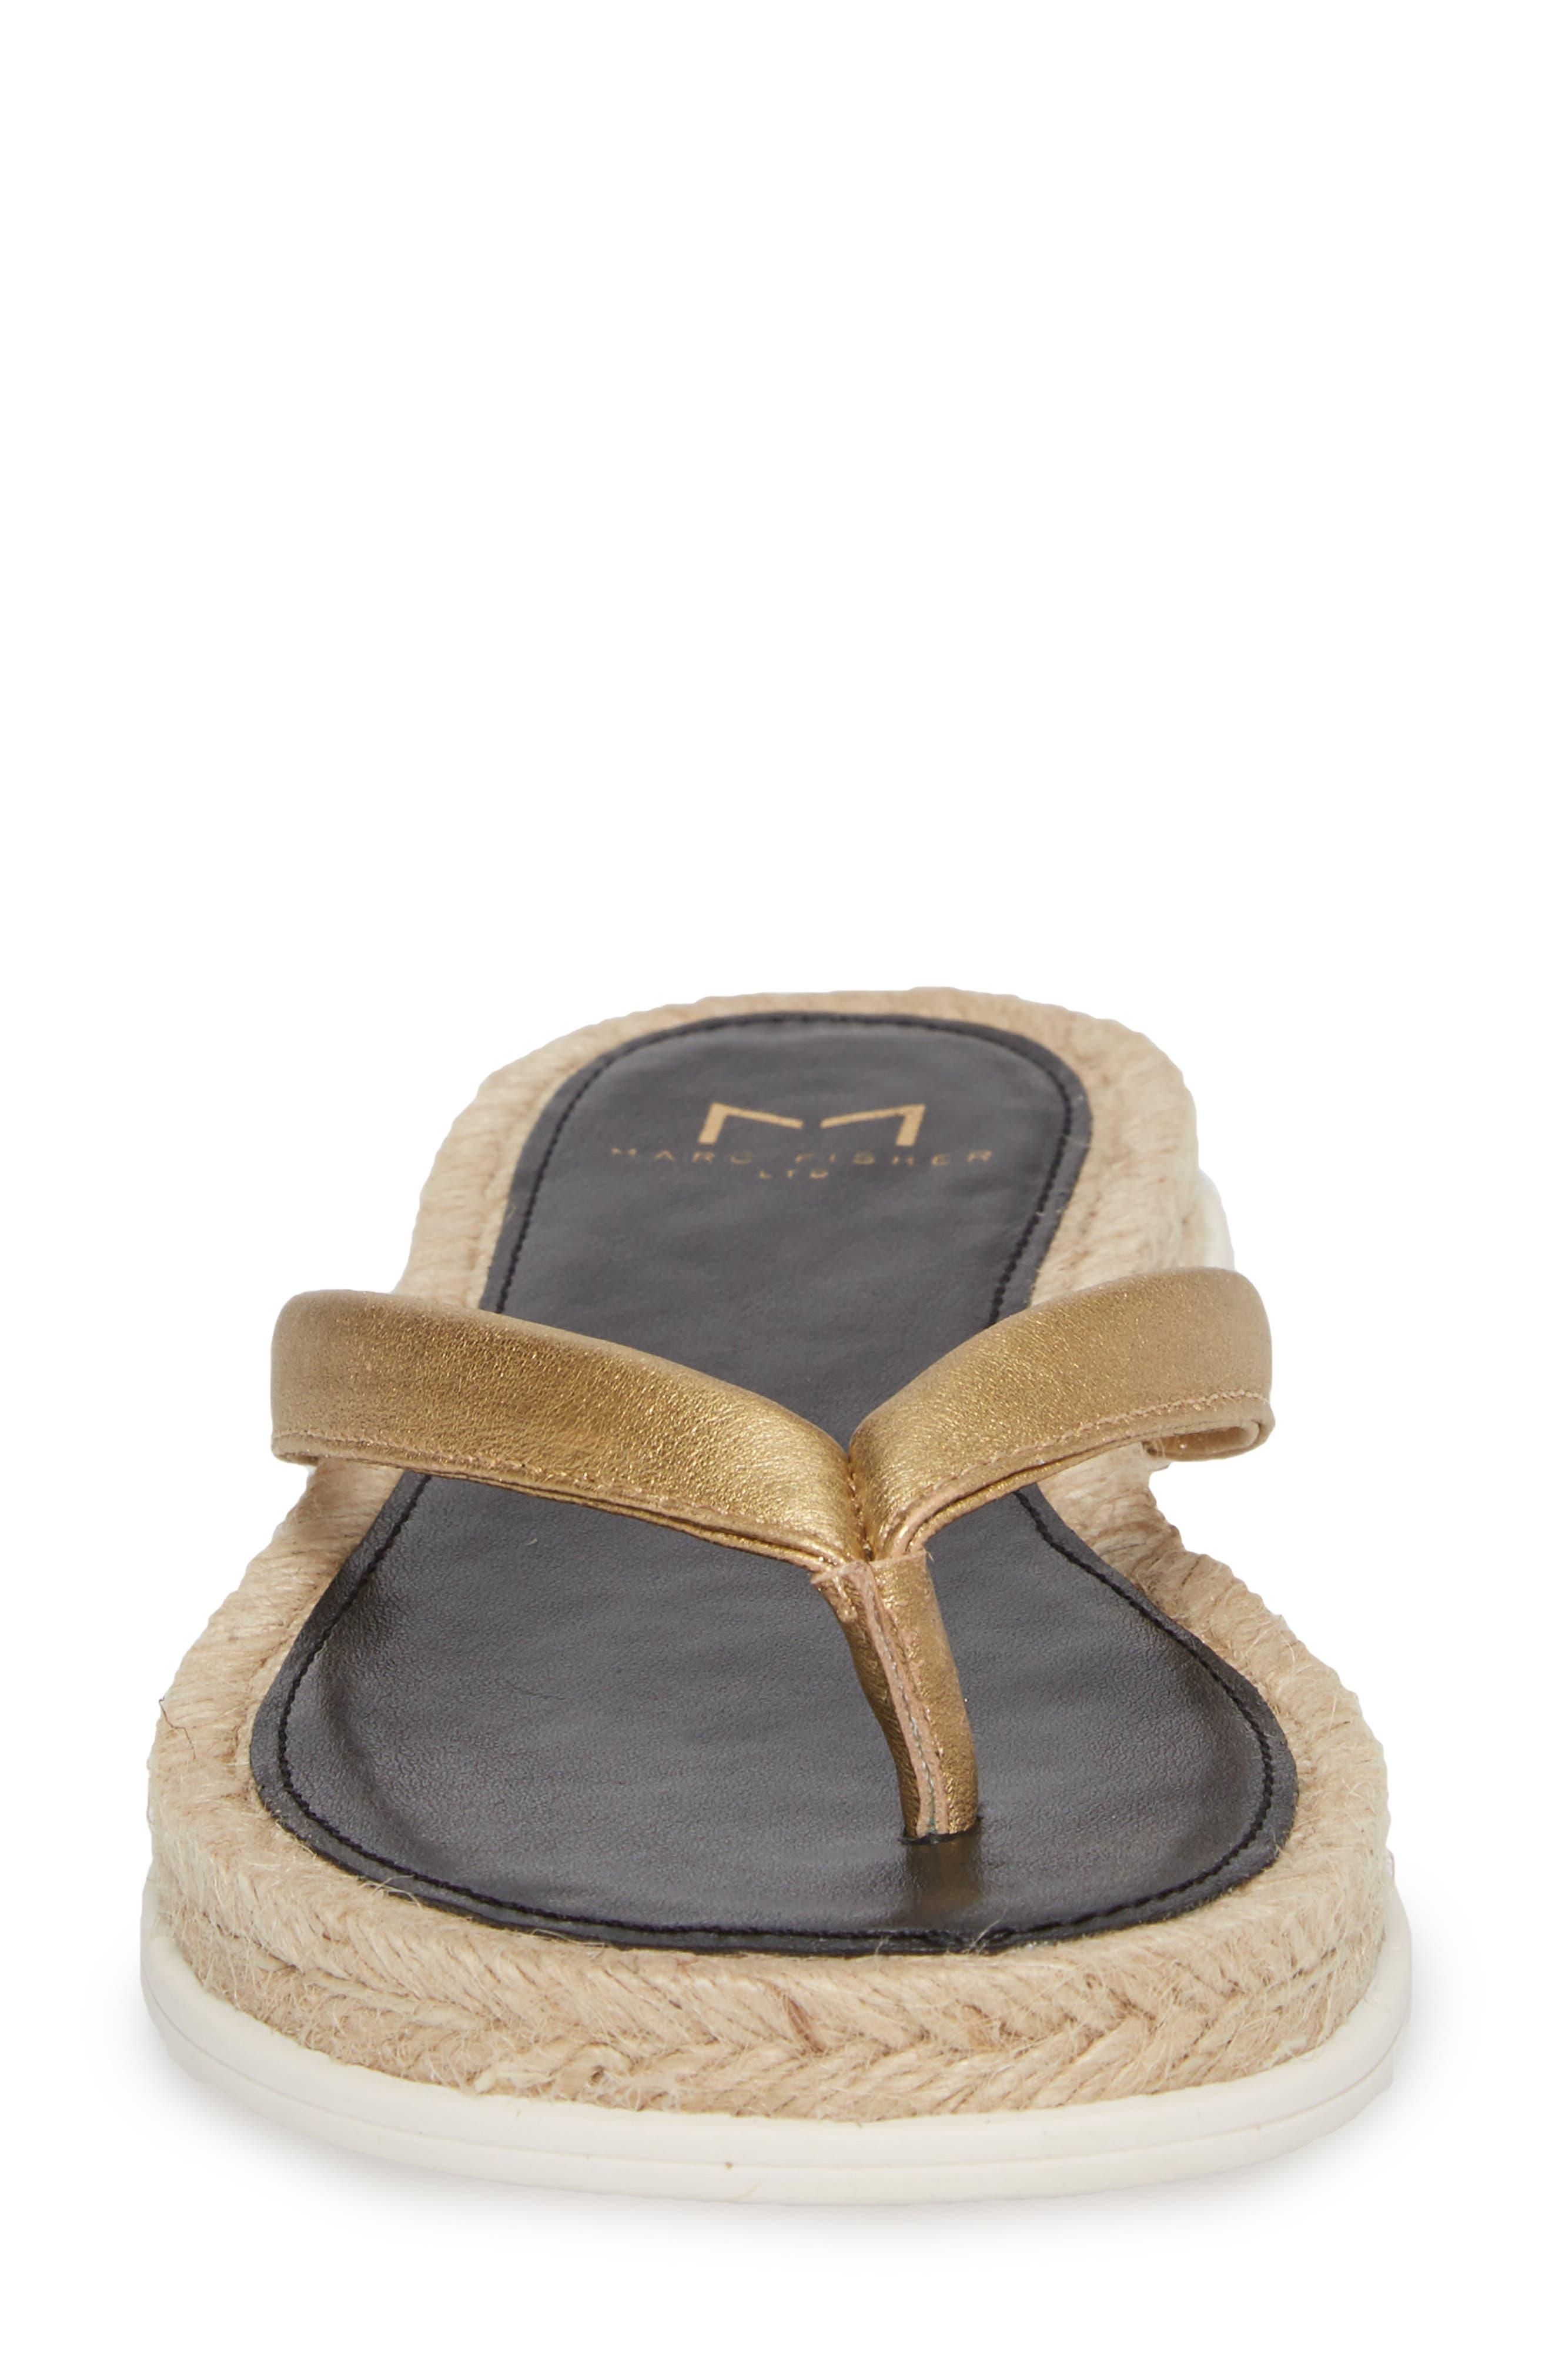 Utah Espadrille Sandal,                             Alternate thumbnail 12, color,